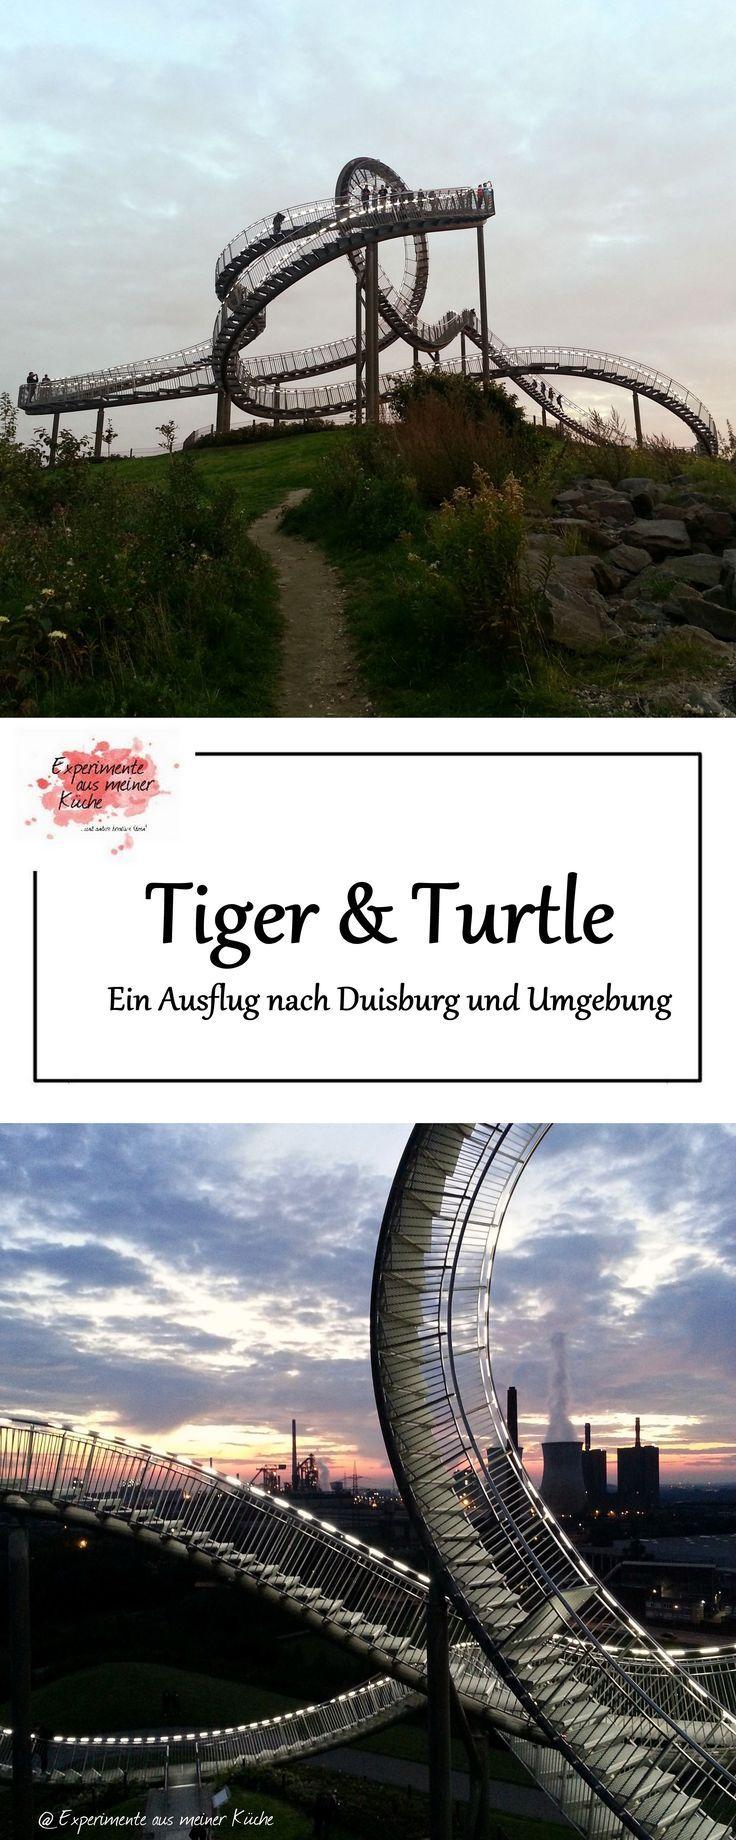 ausflugstipp tiger and turtle in duisburg in 2019. Black Bedroom Furniture Sets. Home Design Ideas